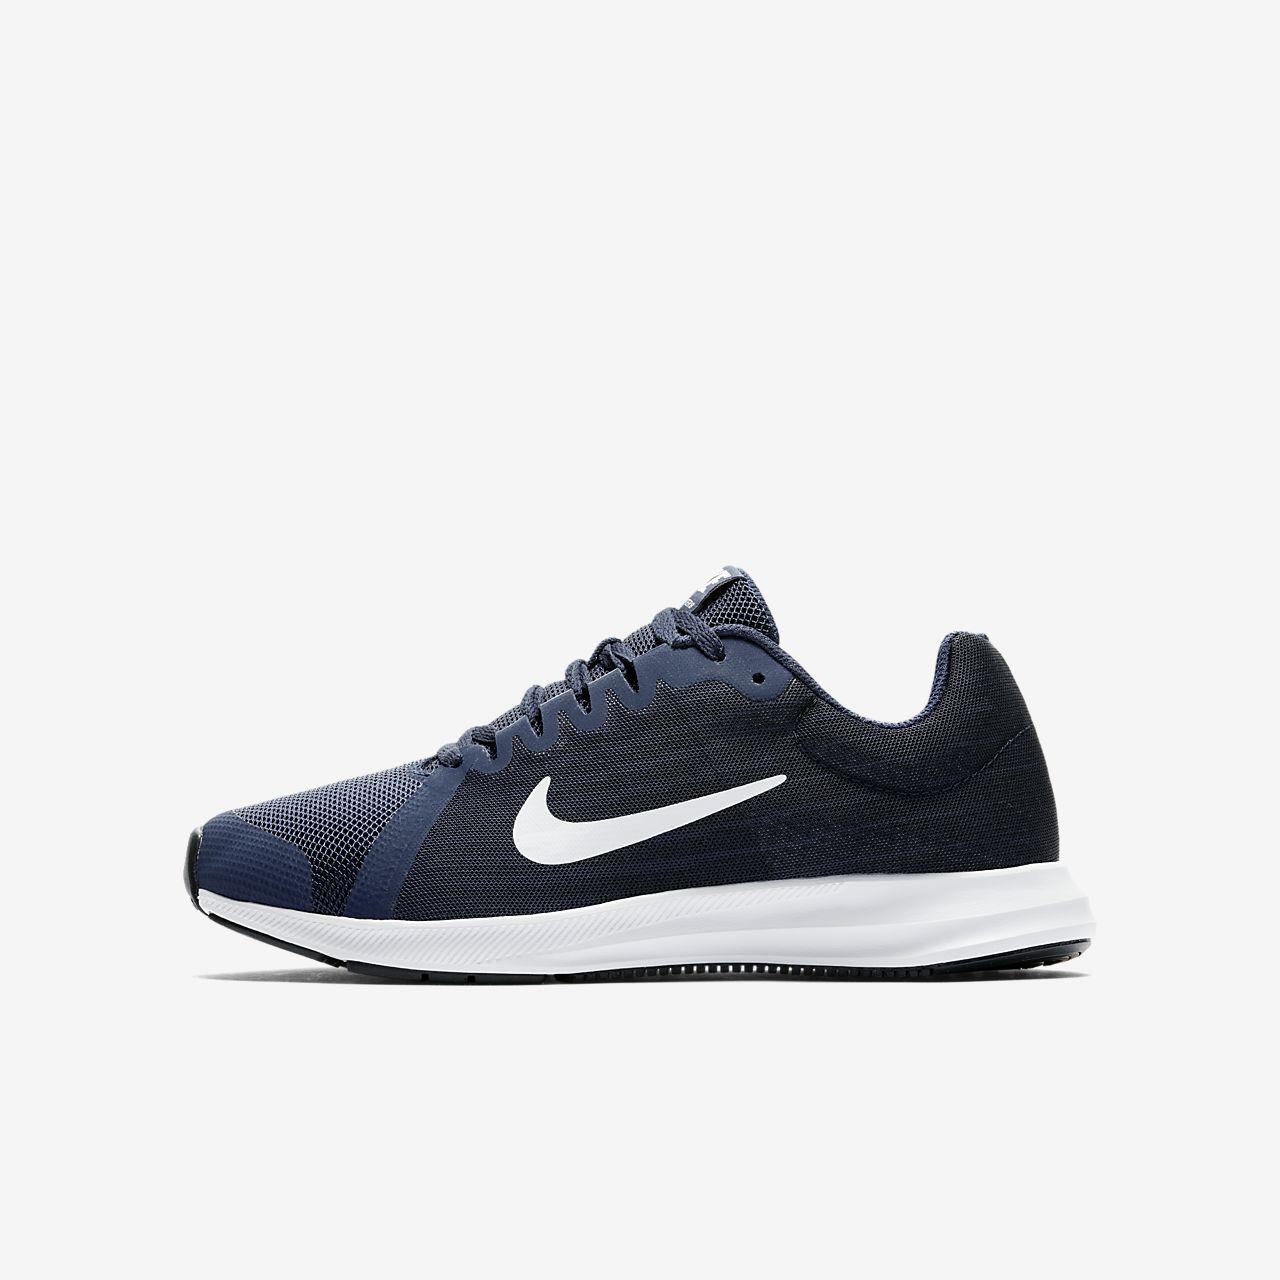 Sapatilhas de running Nike Downshifter 8 Júnior